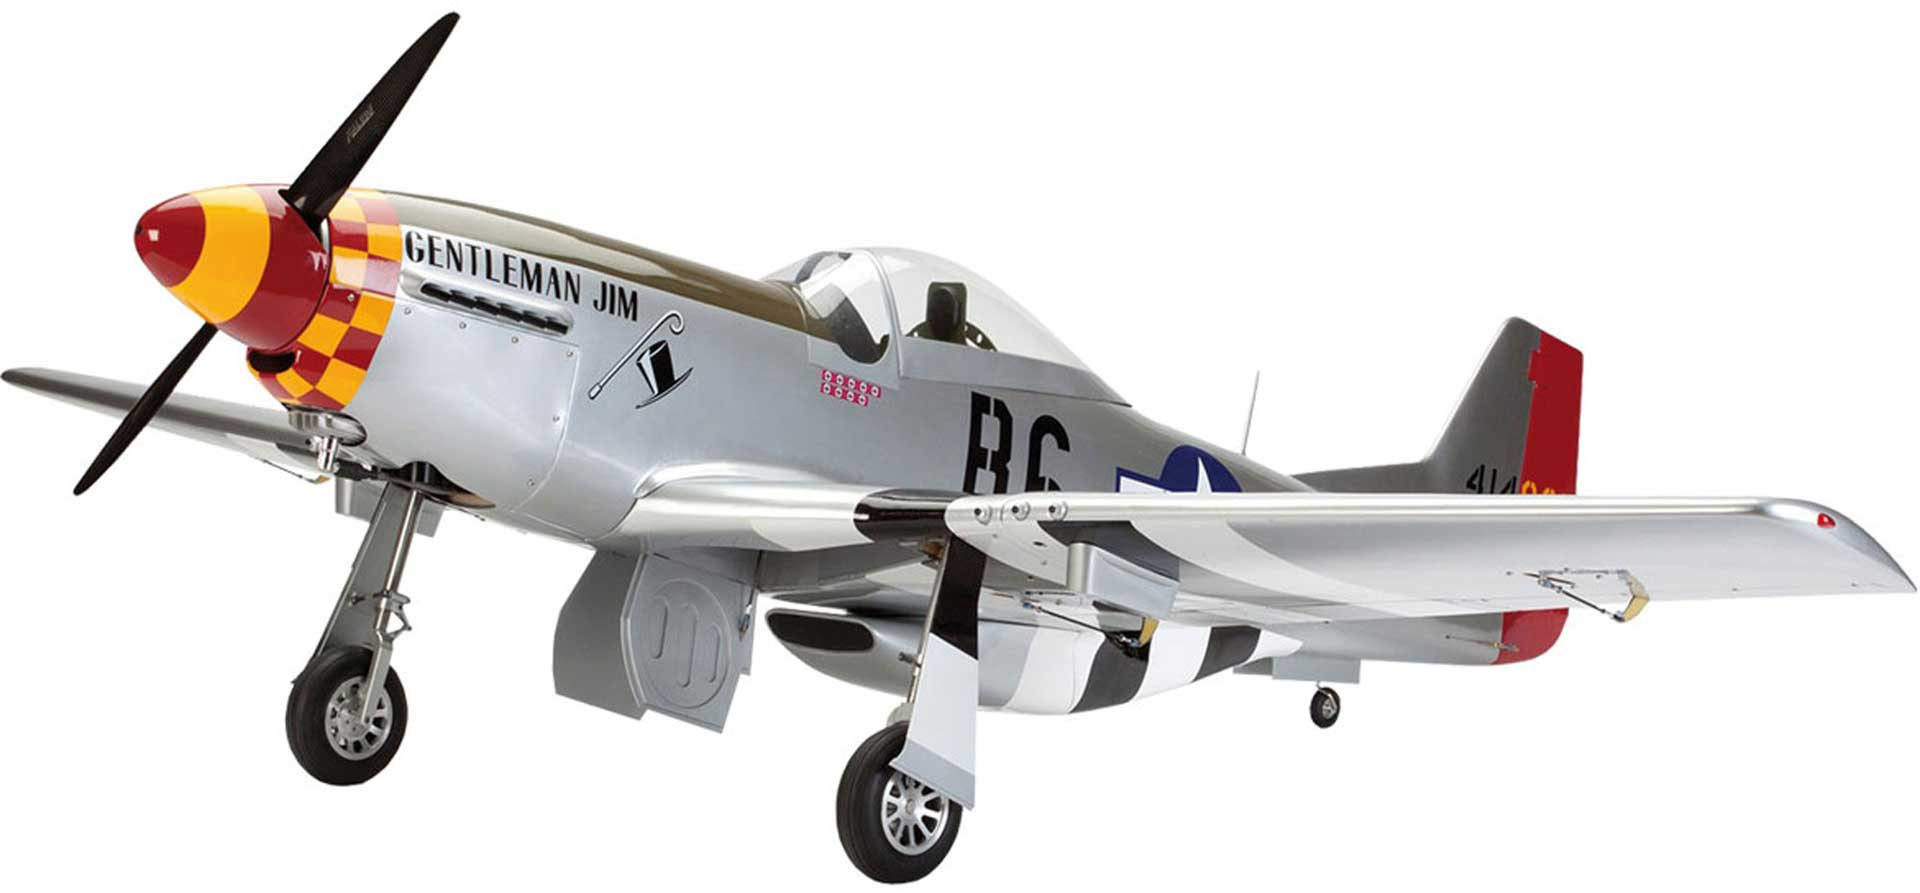 HANGAR 9 P-51D MUSTANG 60CC ARF 2,26M GEBAUTES MODELL, IN HOLZBAUWEISE